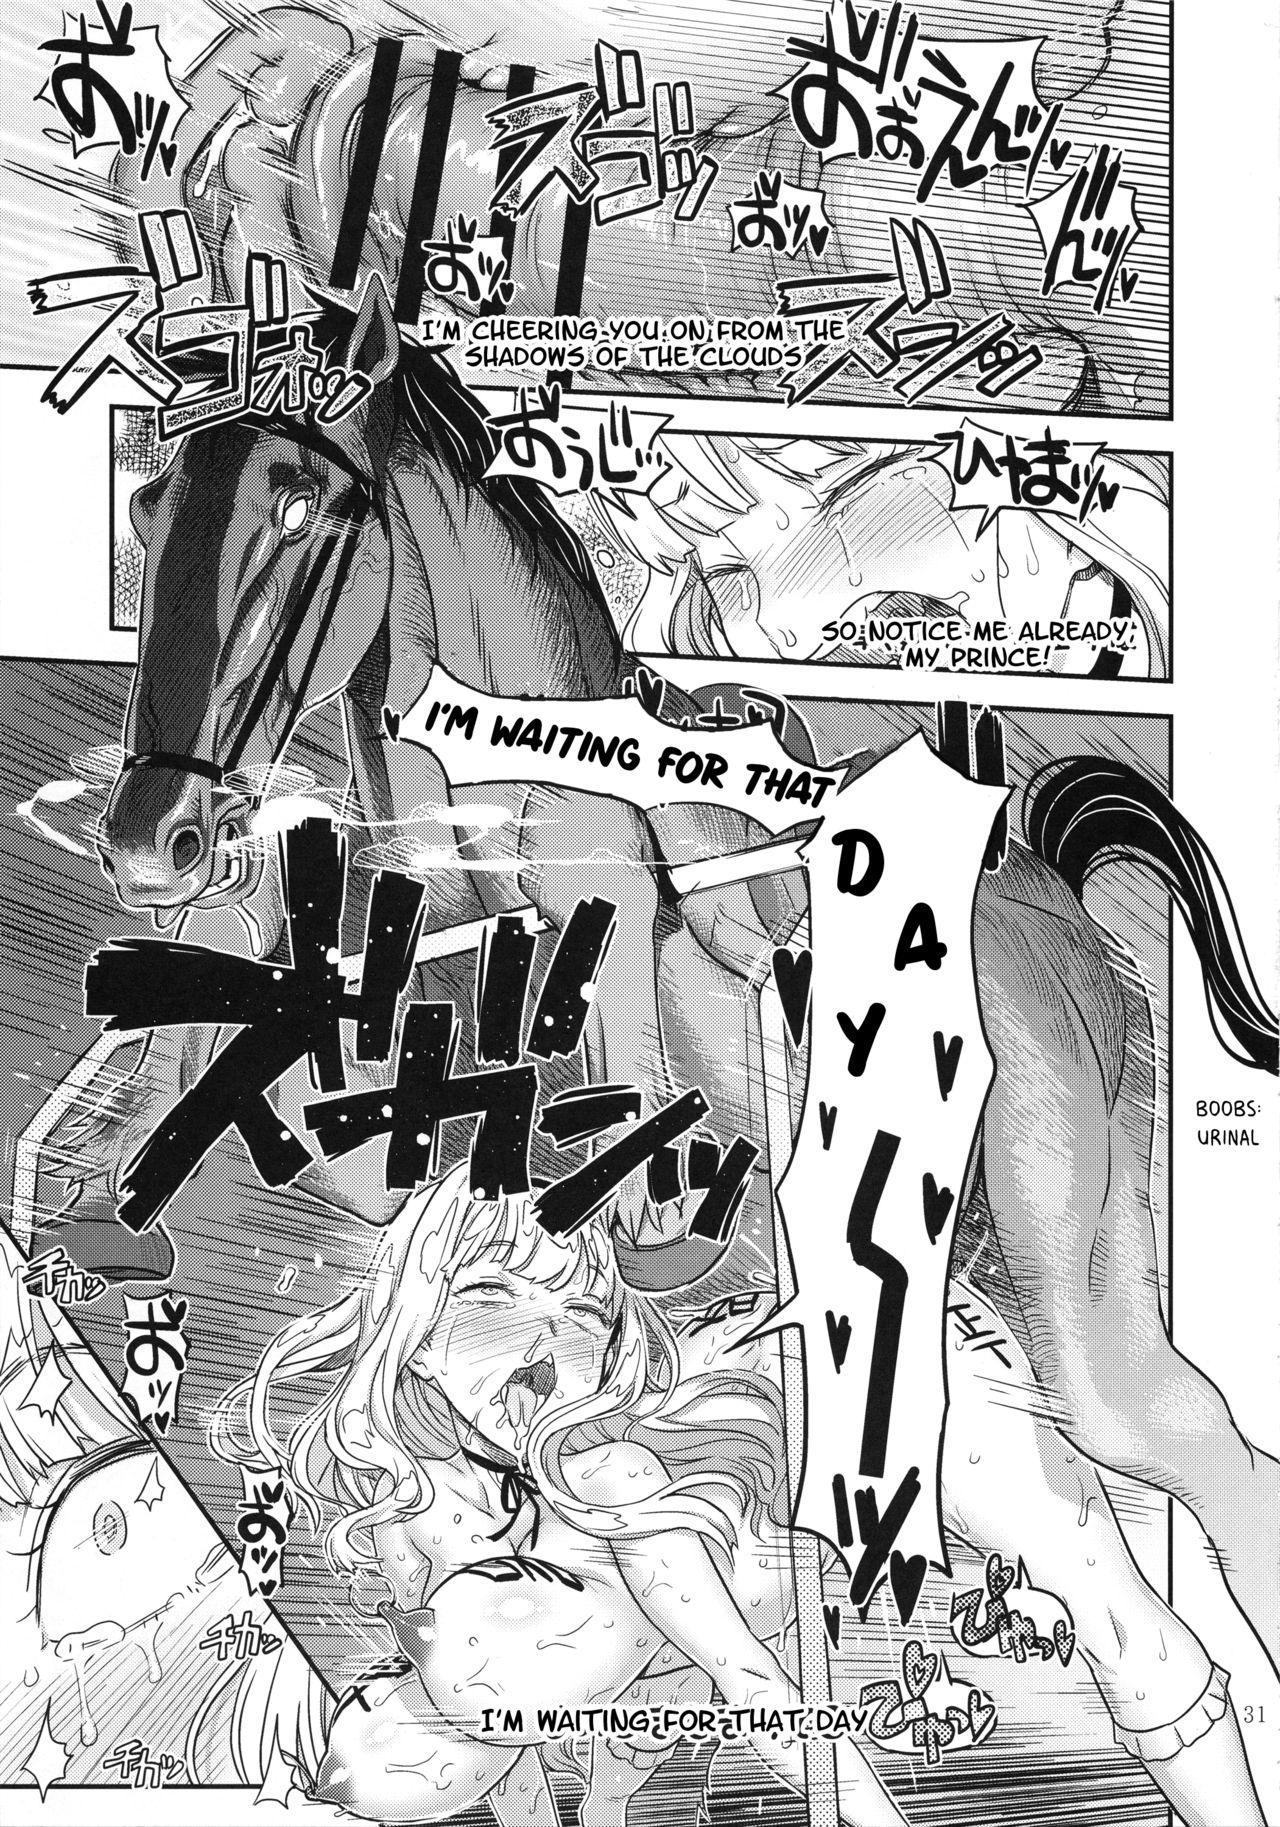 Koukai Tanetsuke Hentai Koubi 2 29